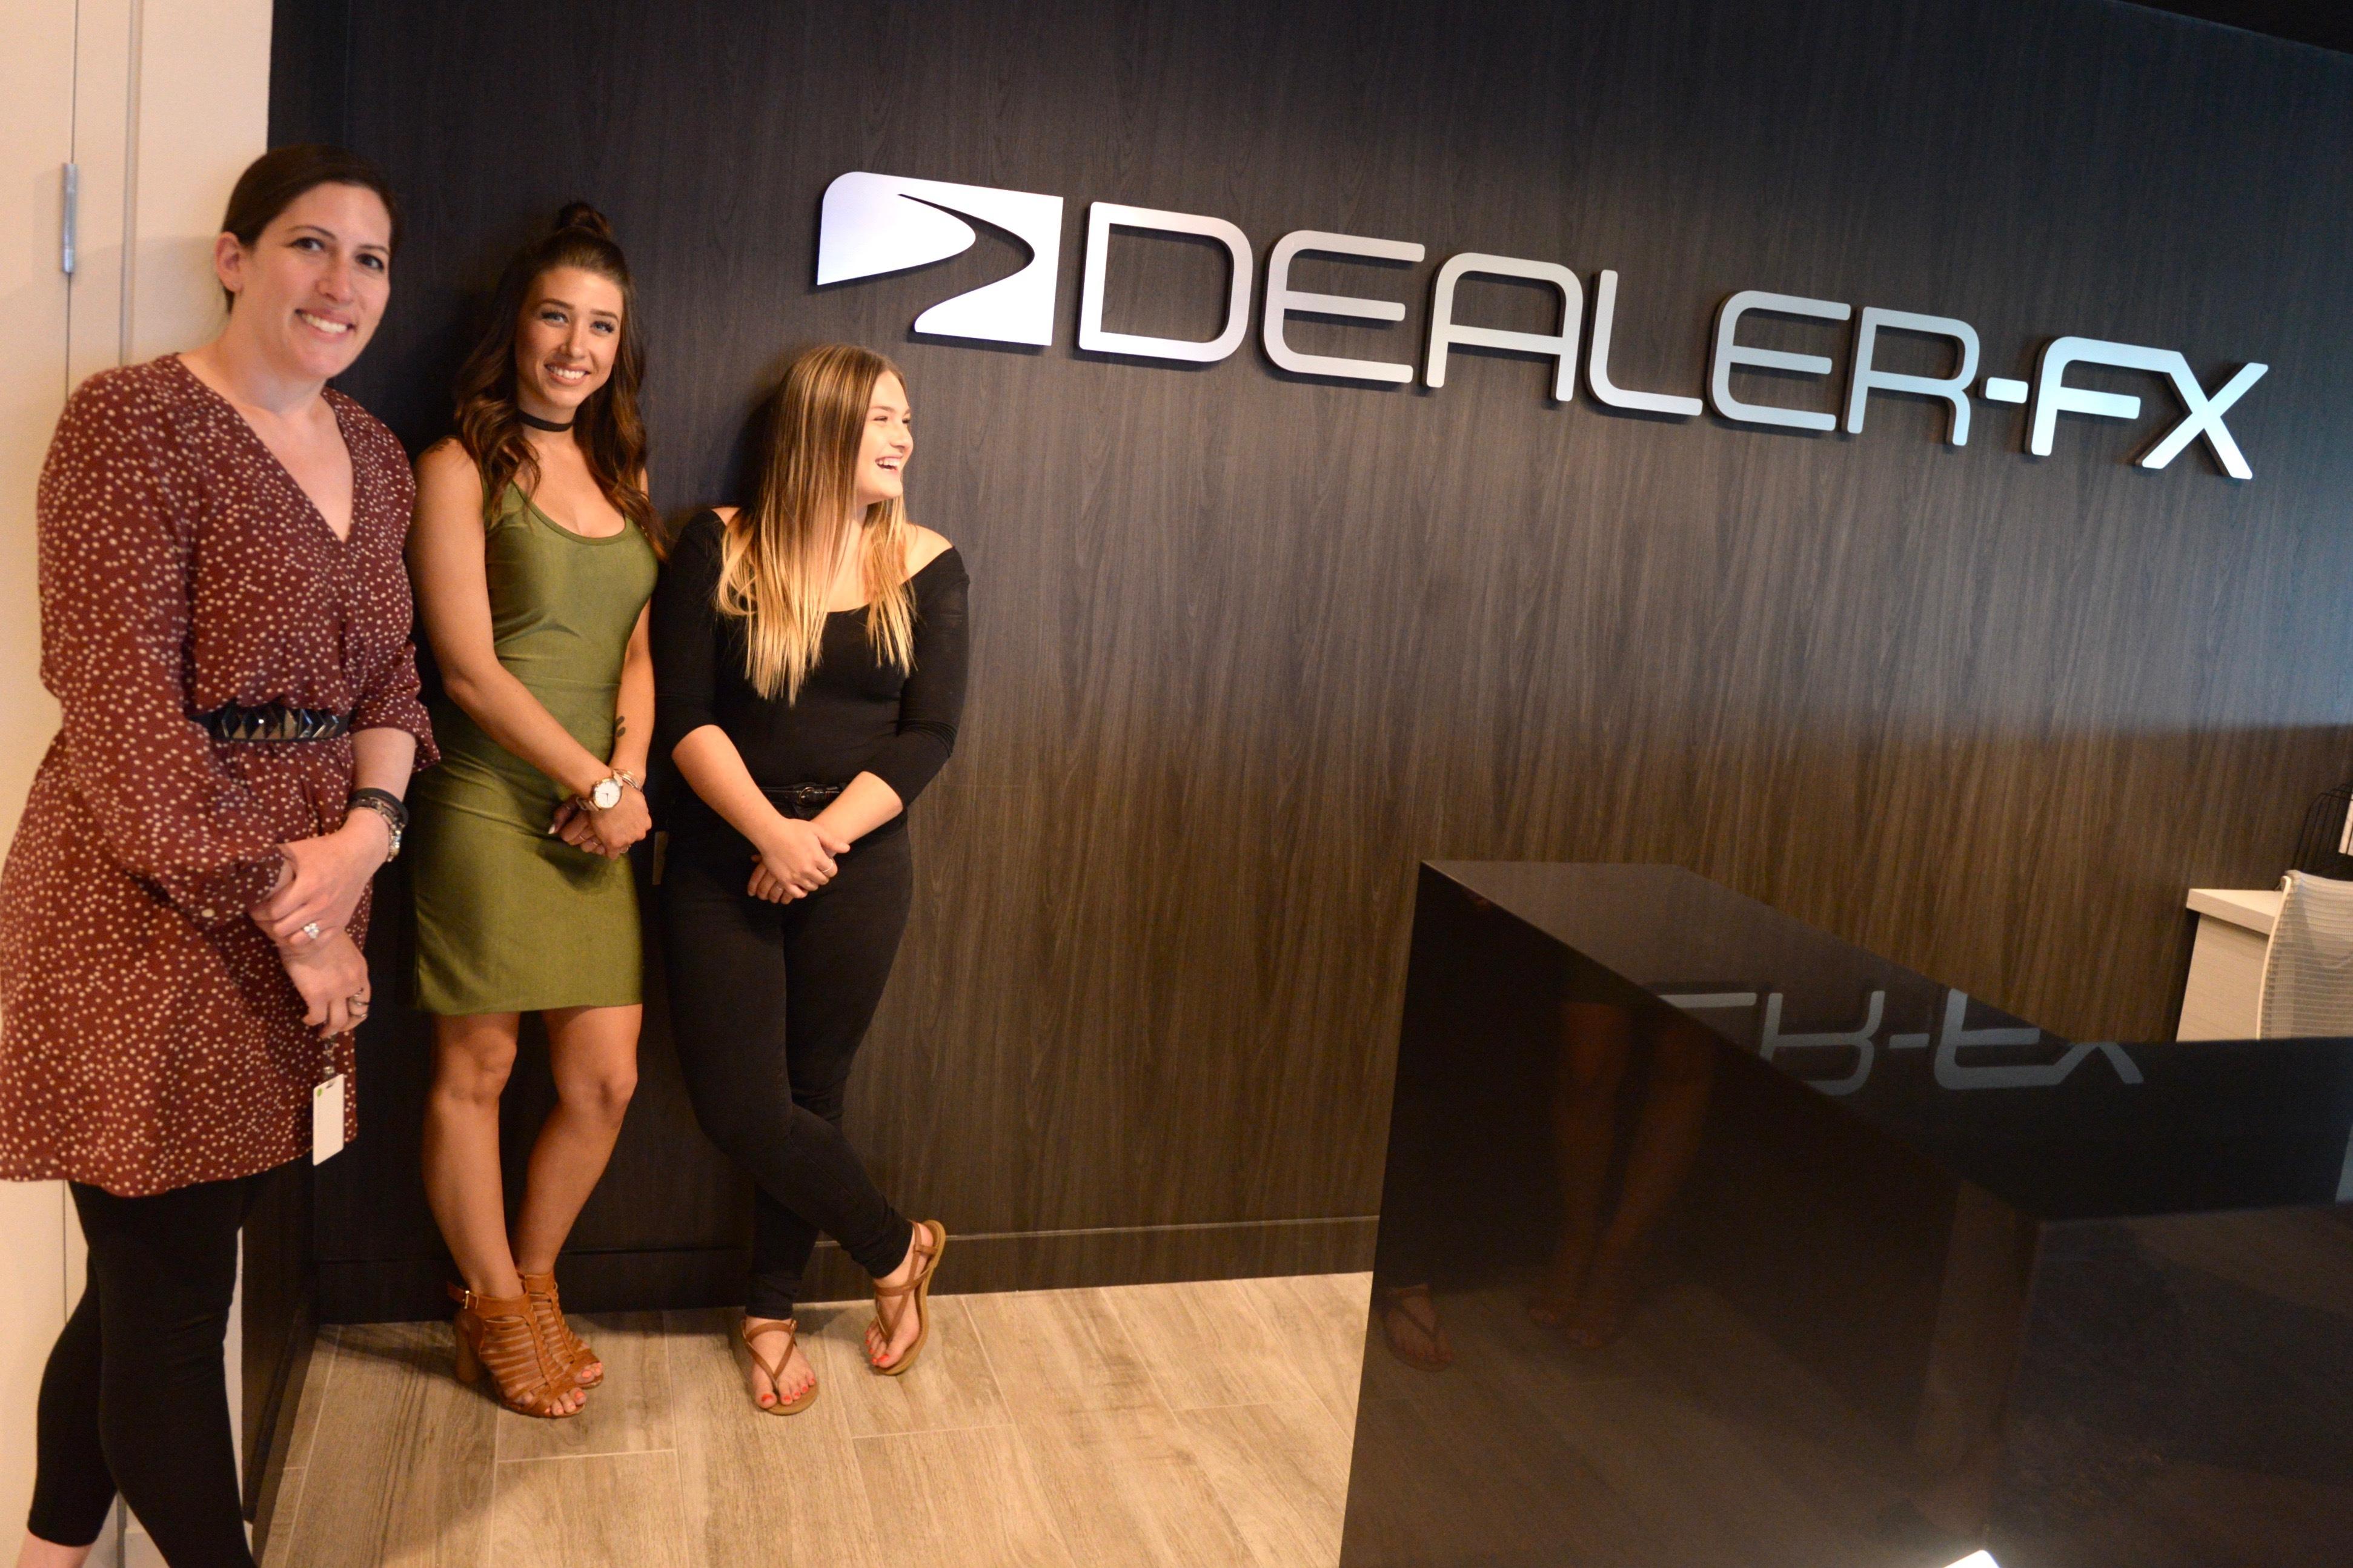 Fx dealer